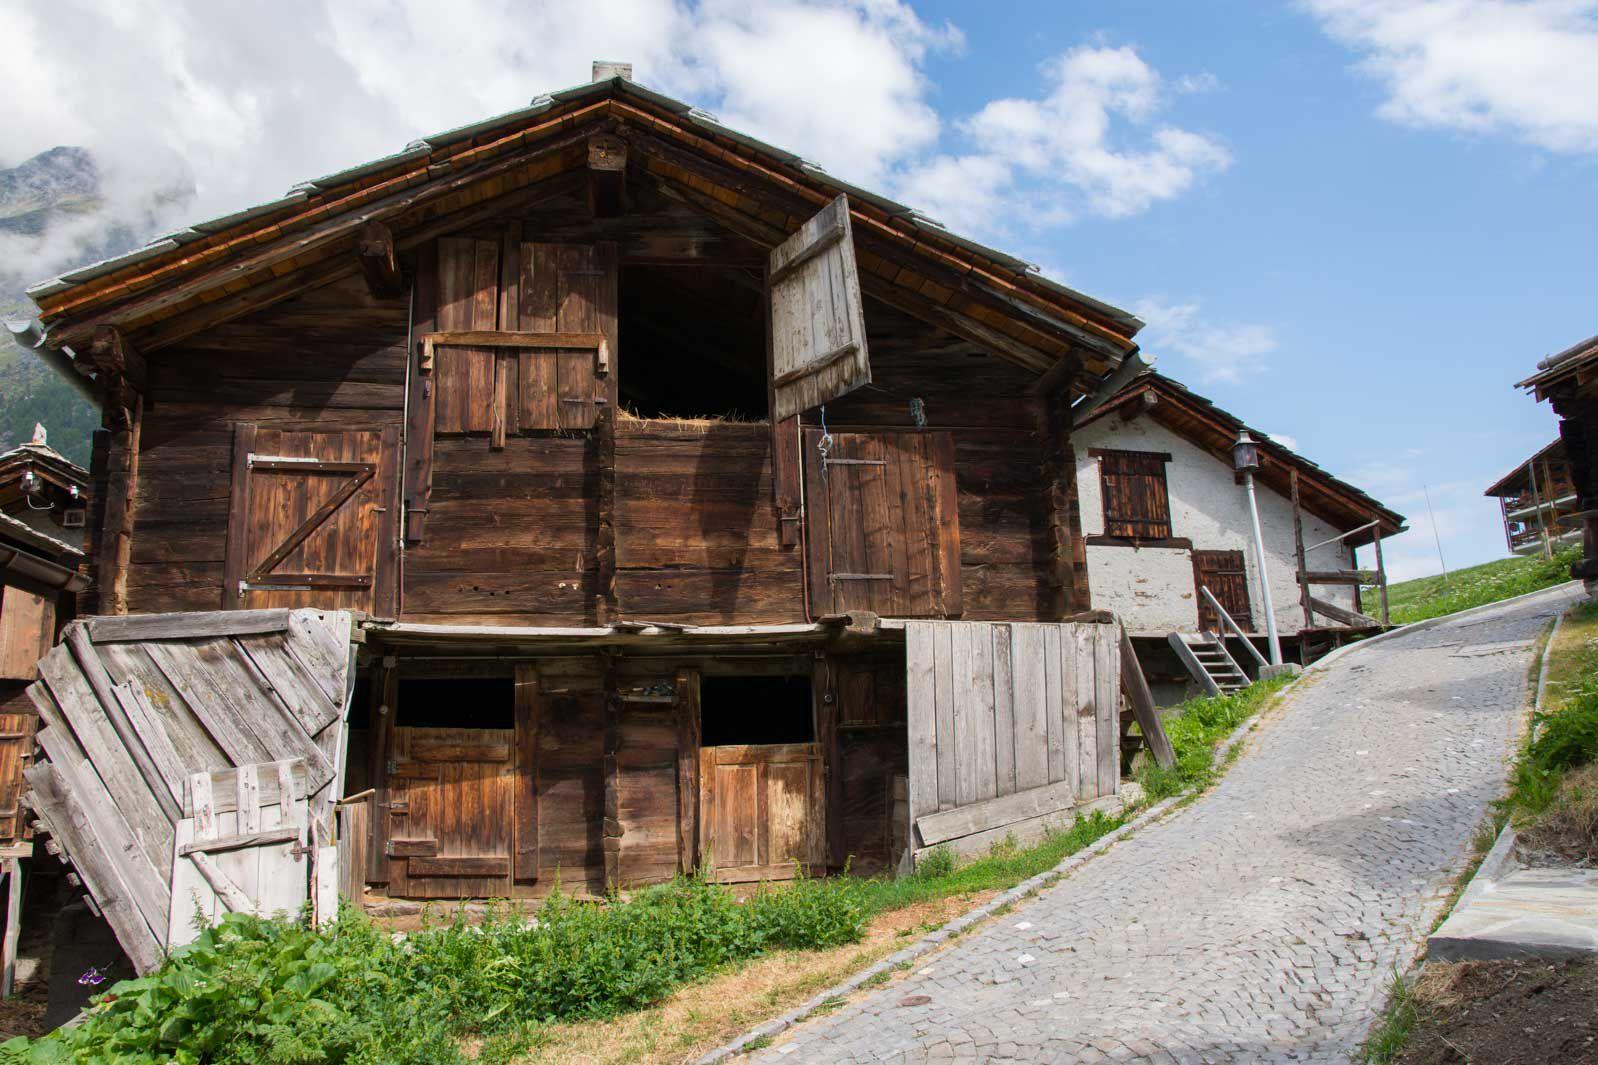 Randonnée de la passerelle Charles Kuonen de Randa - Suisse